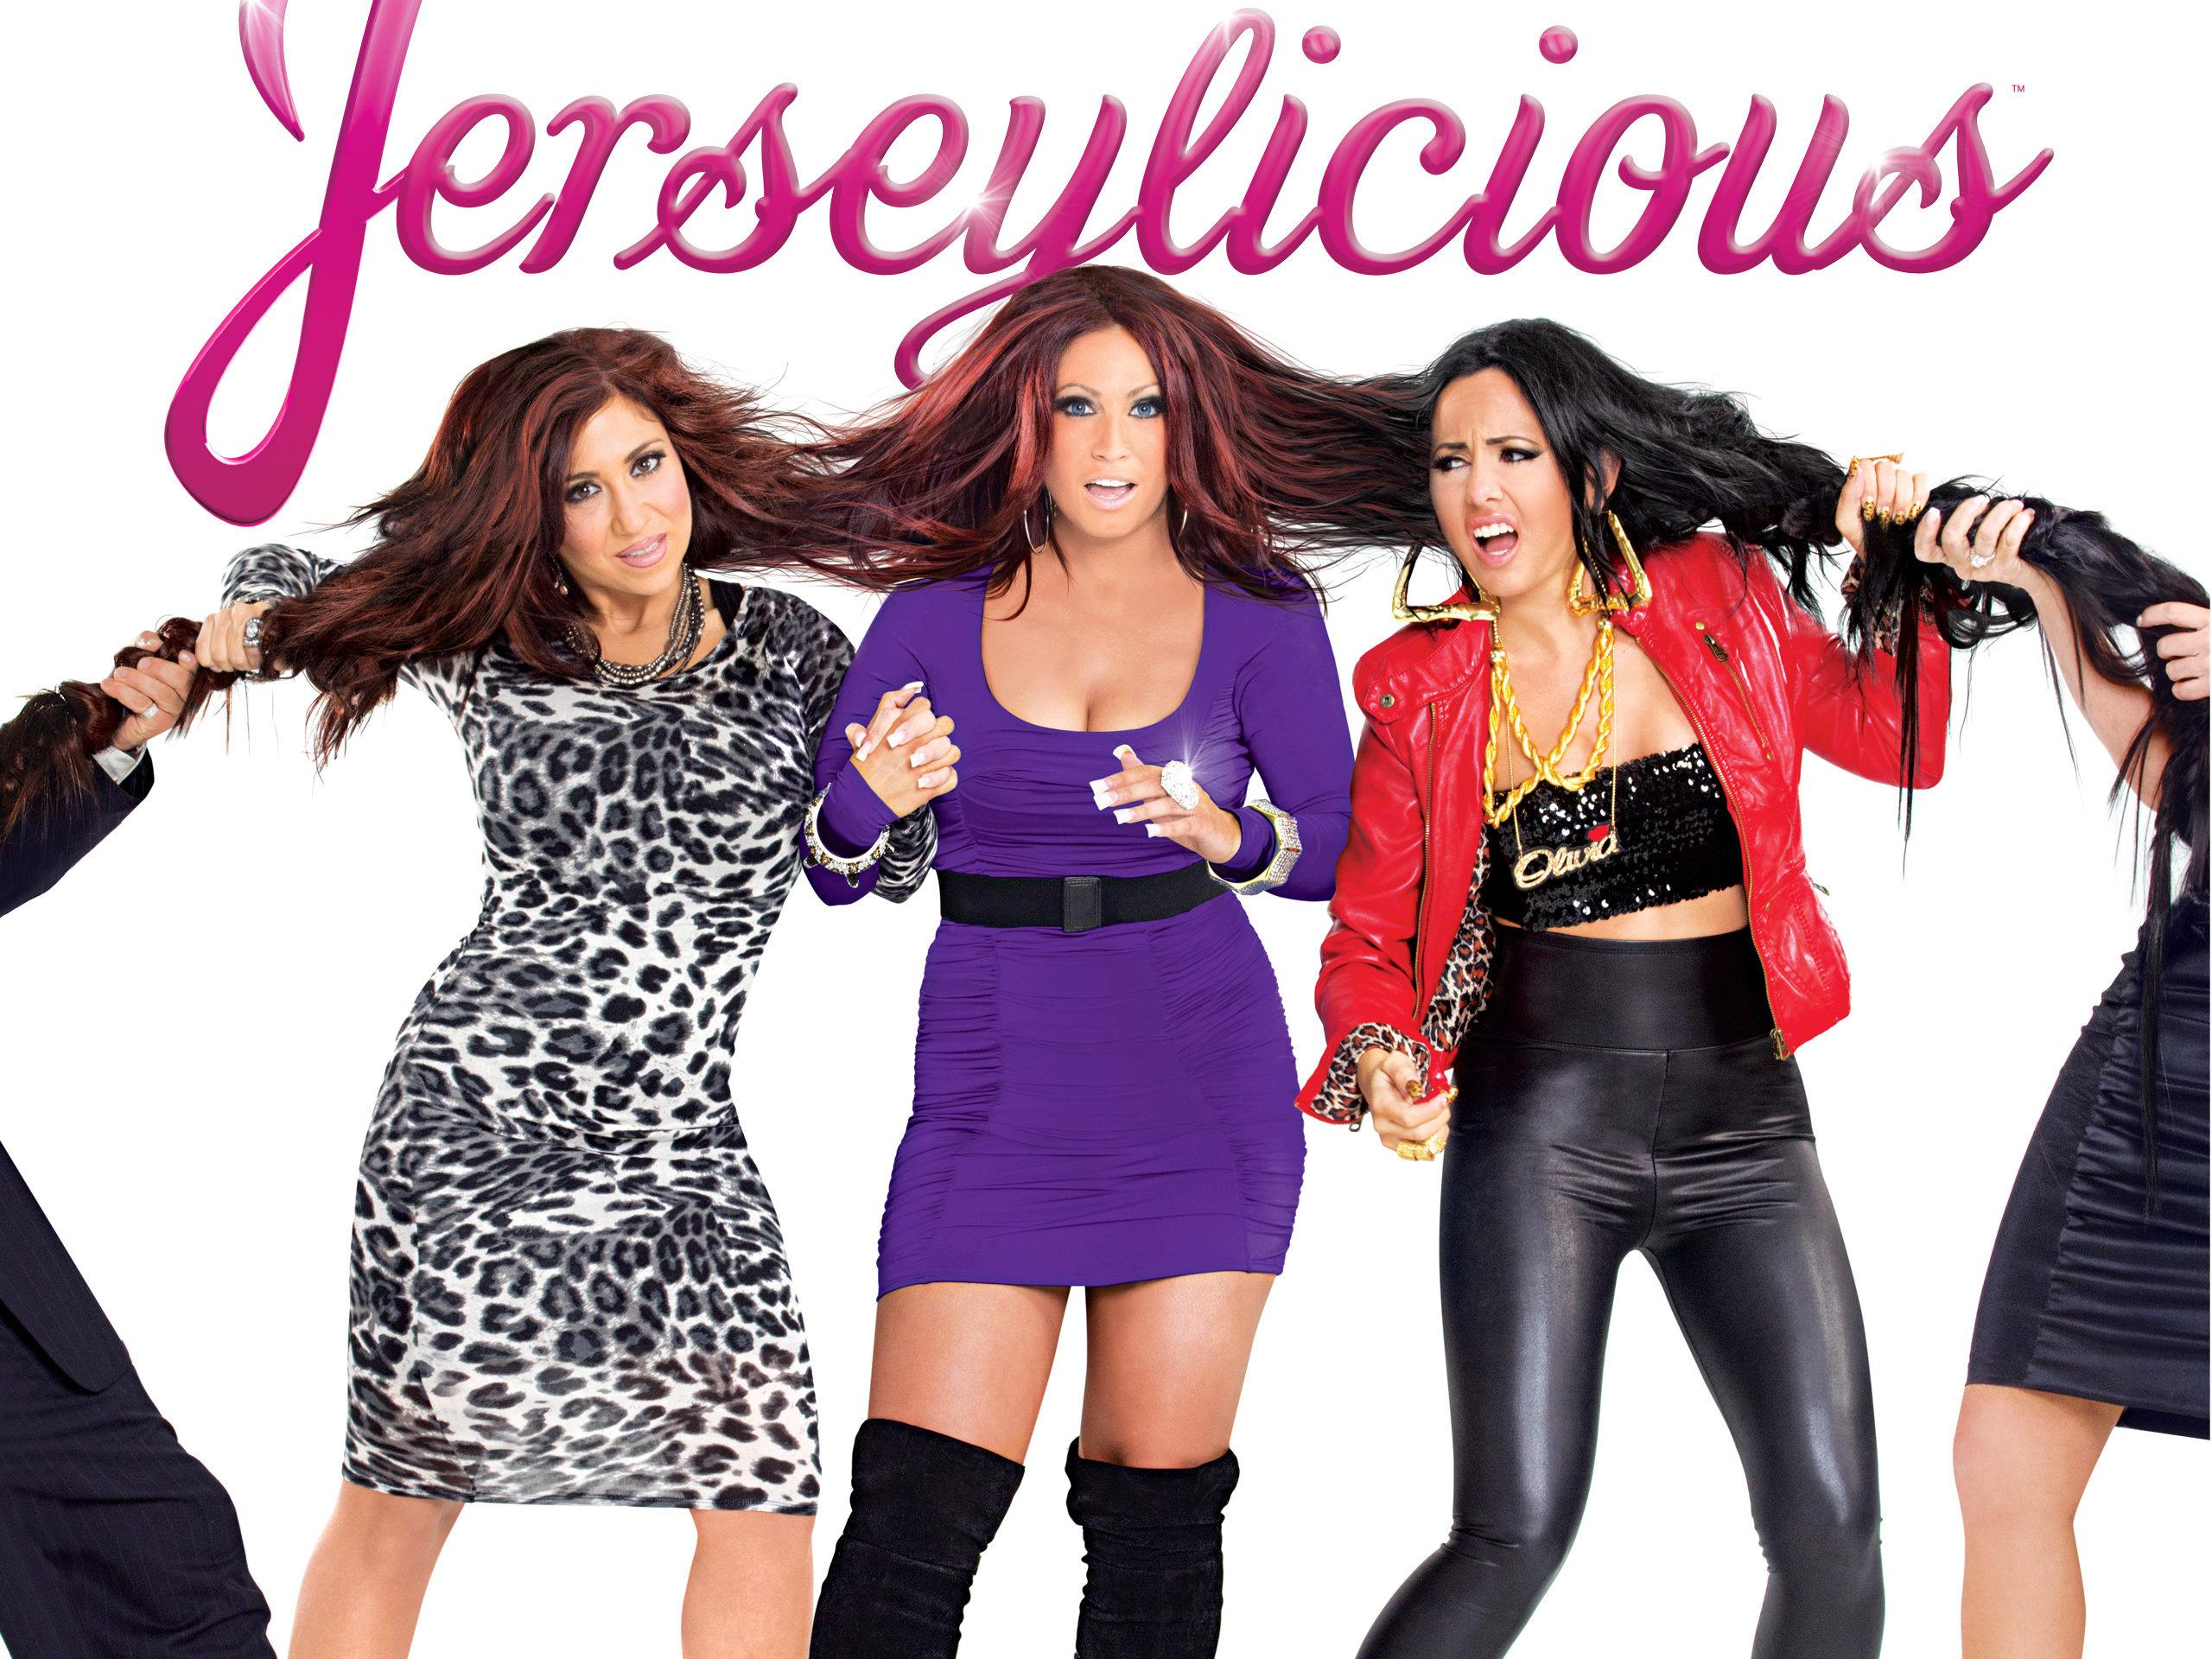 Prime Video: Jerseylicious Season 4